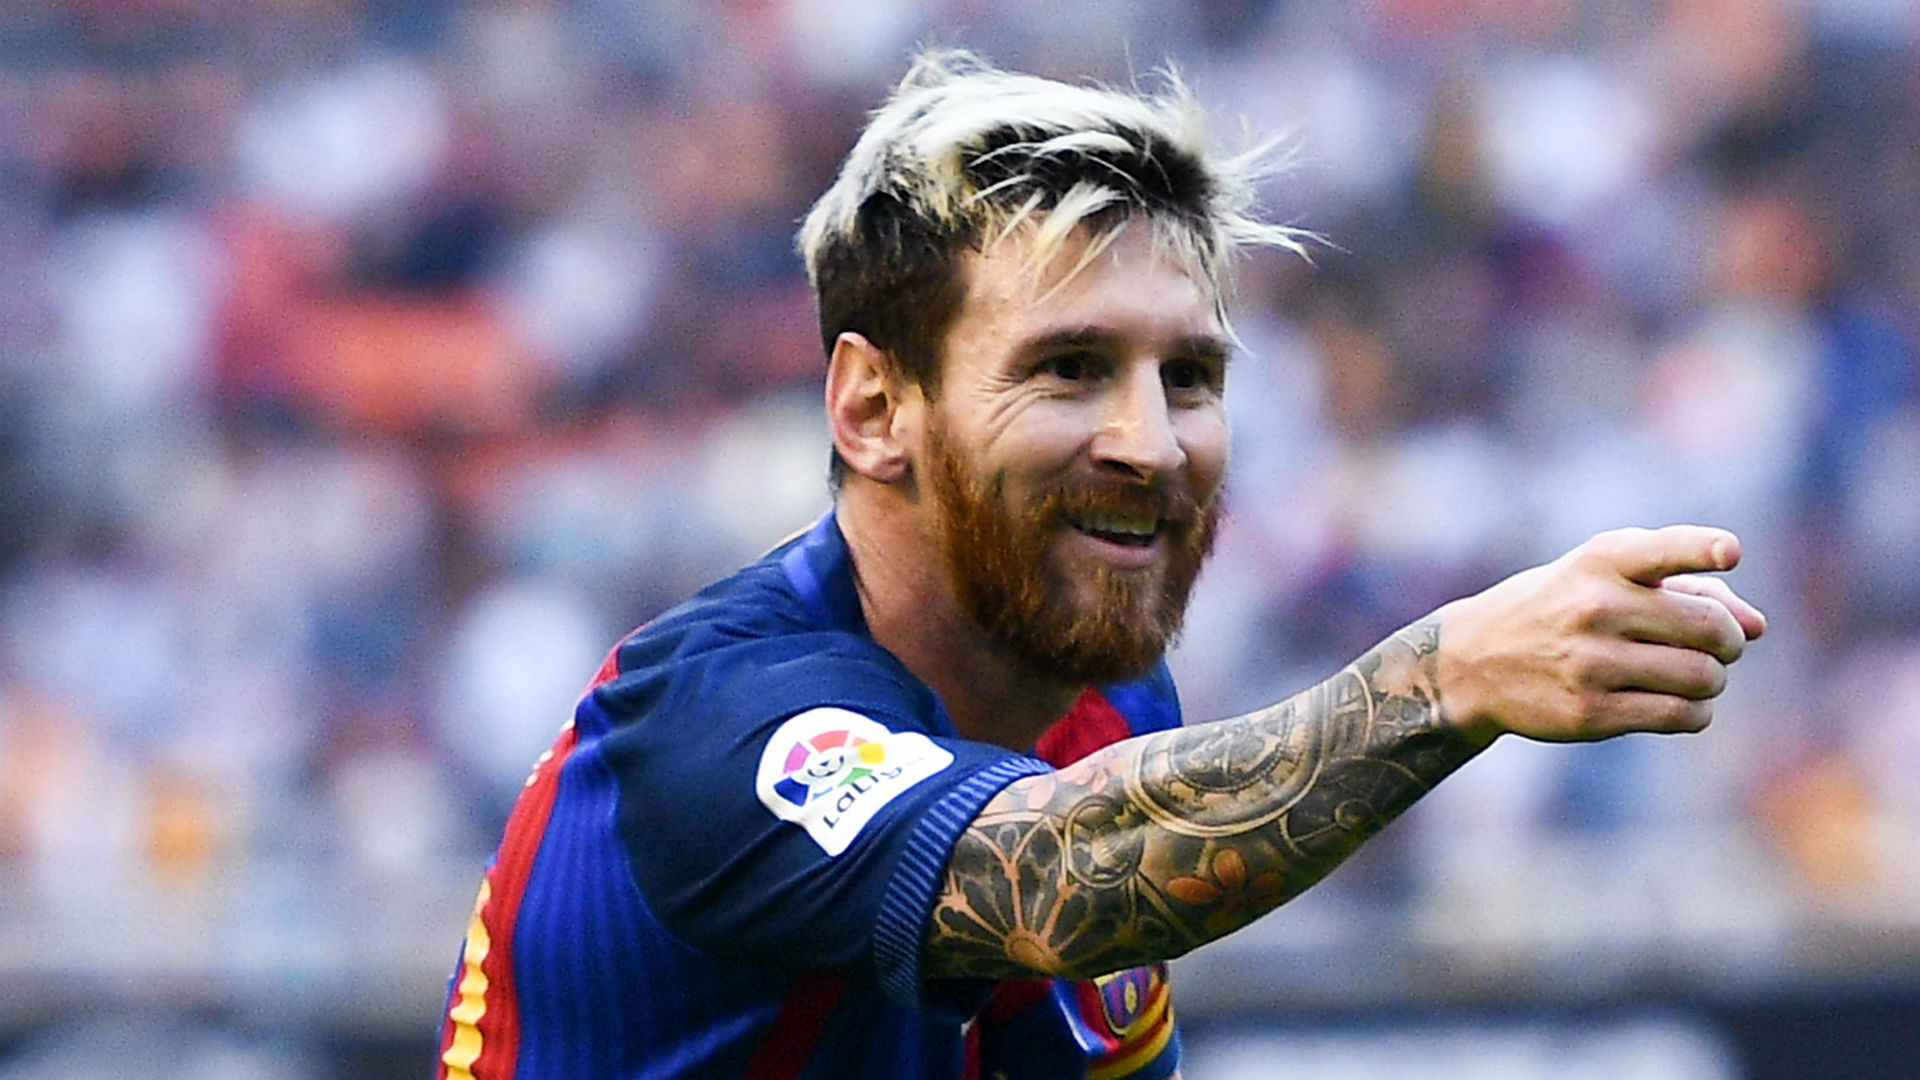 Cantona Messi Has Become A Poor Mans Justin Bieber